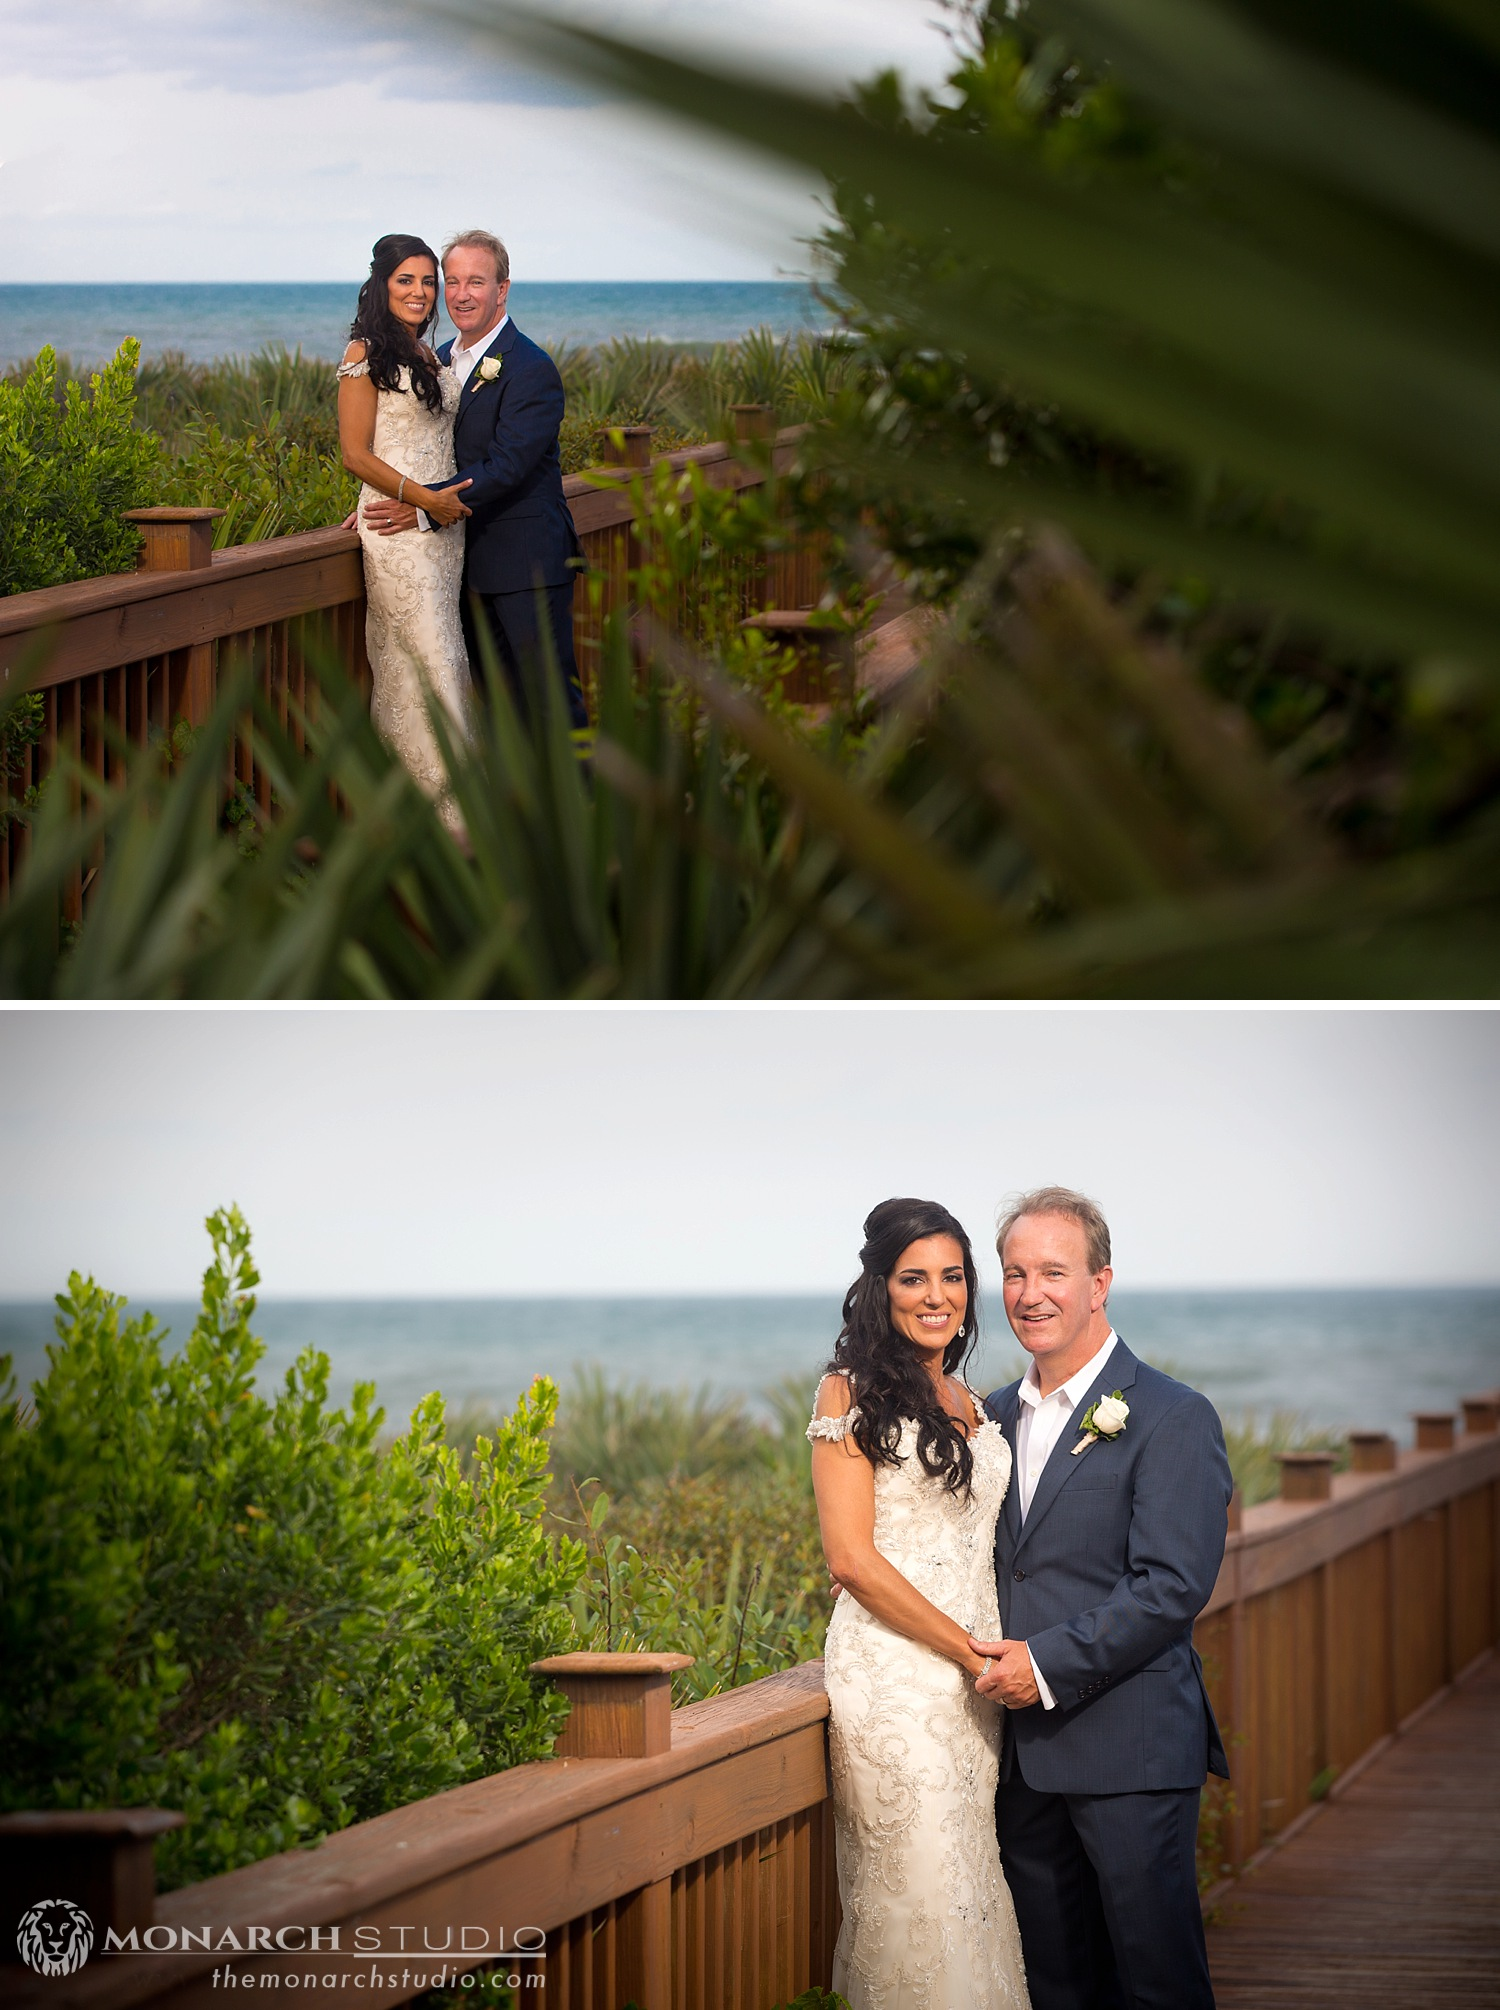 Hammock-Beach-Resort-Wedding-Photography-Palm-Coast-FL_0025.jpg